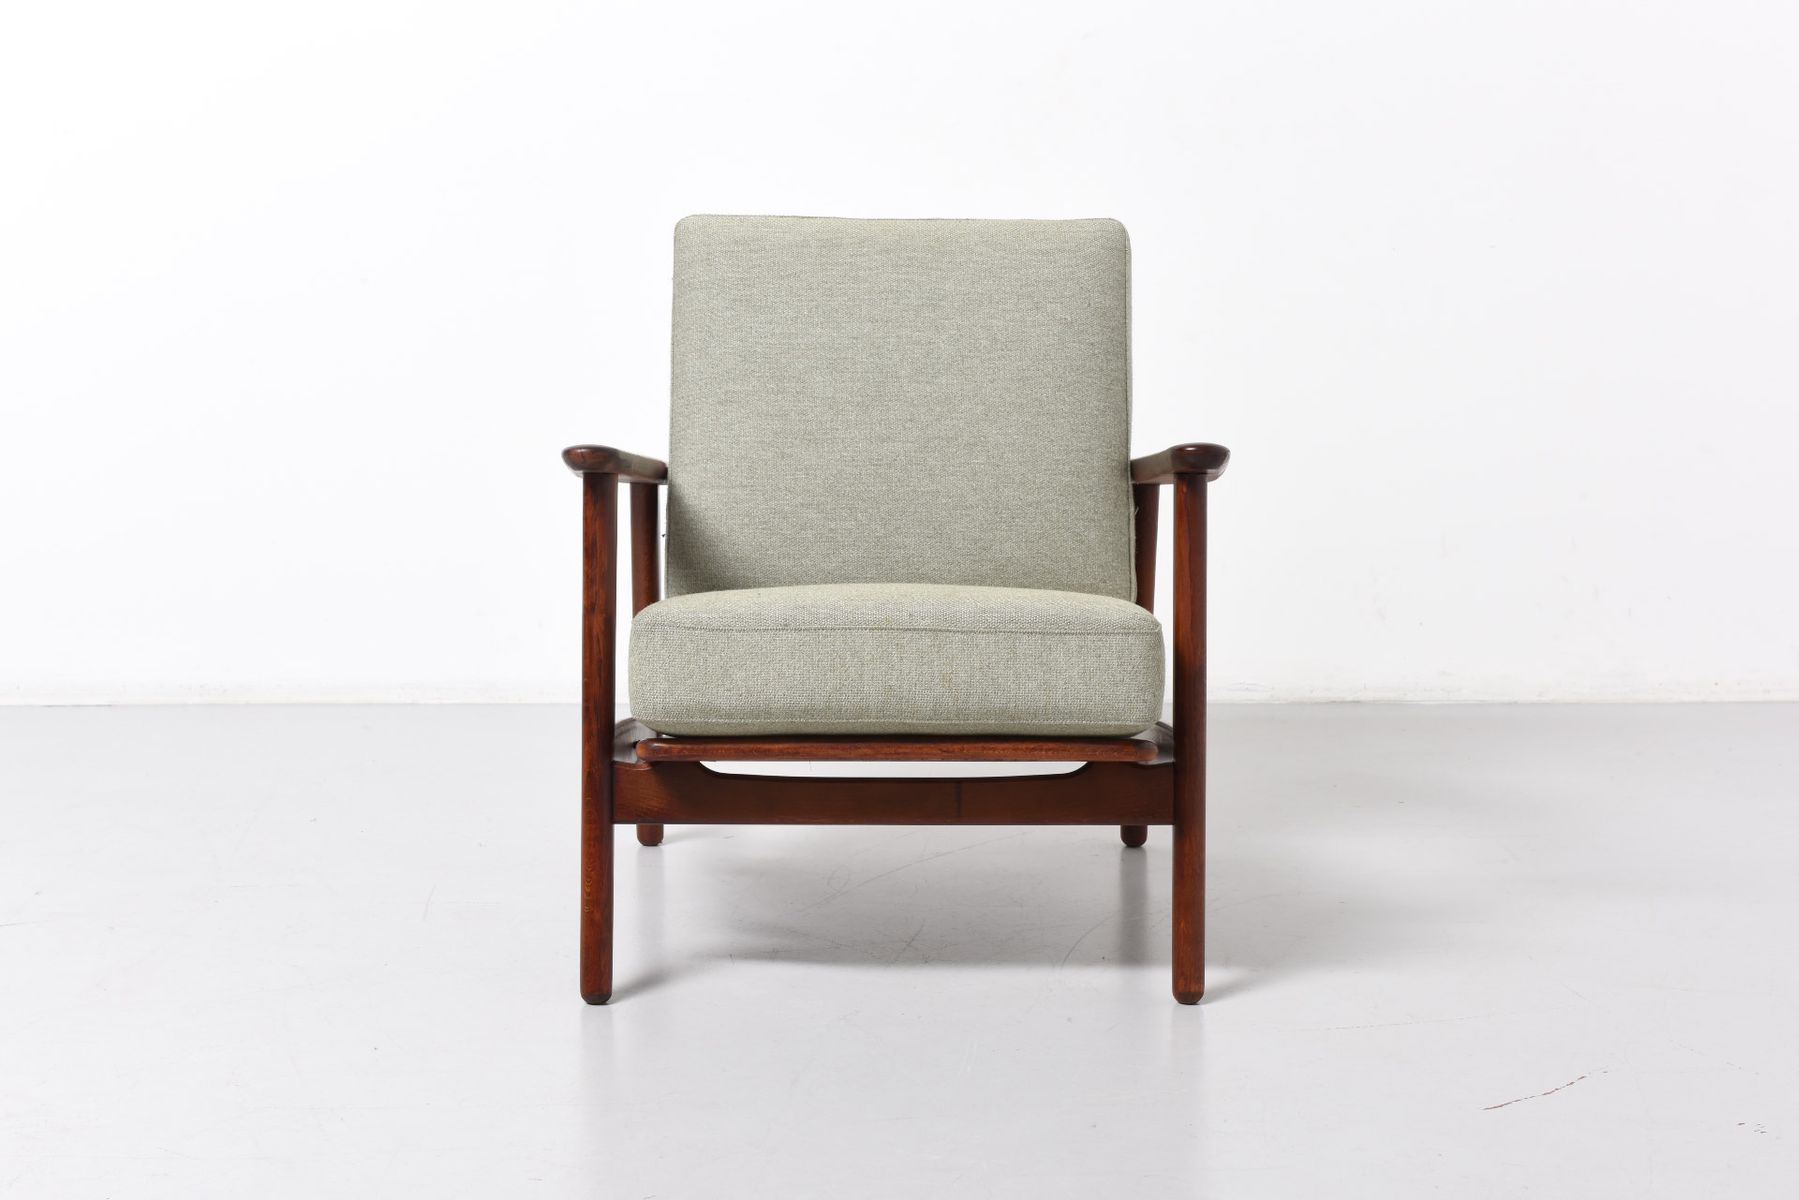 ge 233 sessel von hans j wegner f r getama bei pamono kaufen. Black Bedroom Furniture Sets. Home Design Ideas